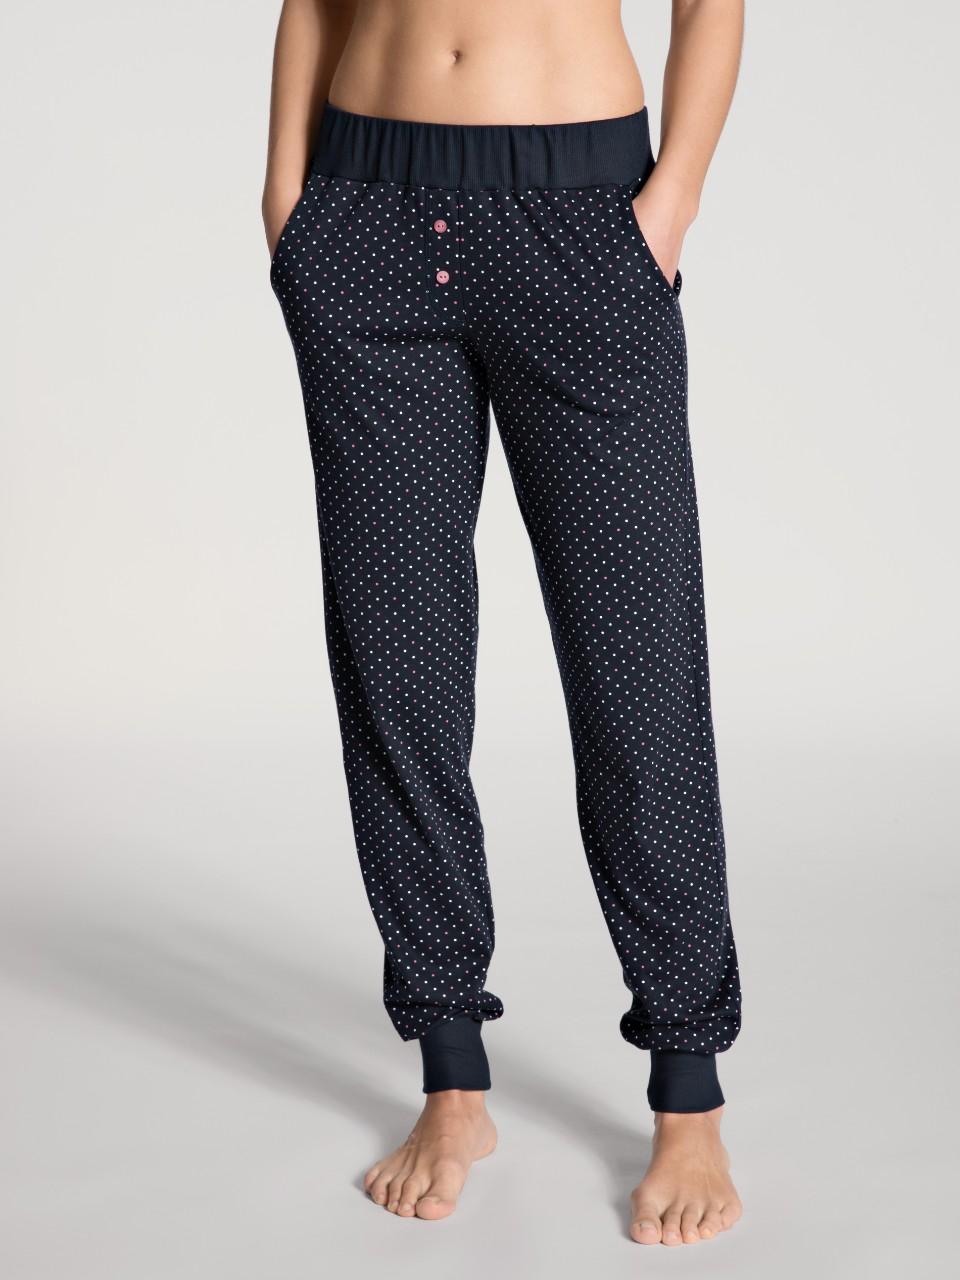 29439 pantalon avec poches 100% coton interlock Prix : 49.95 €